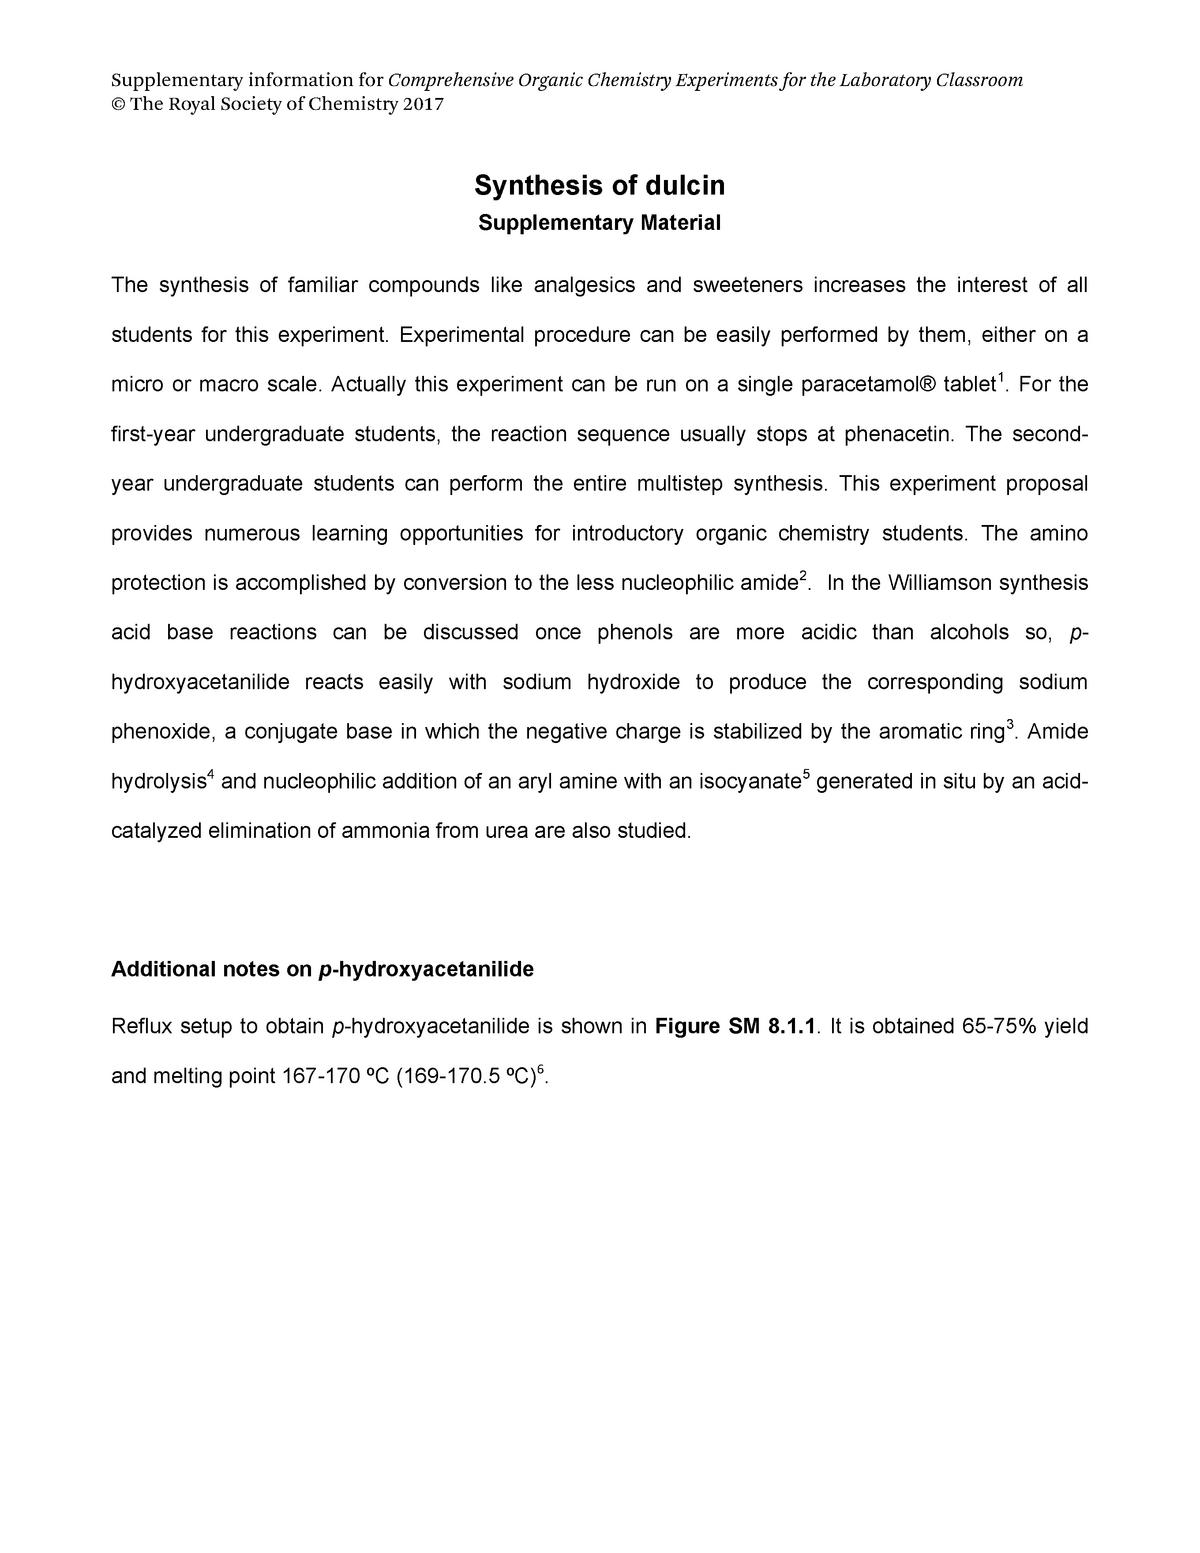 Bk9781849739634-chapter 8 - Math100 Calculus I - UVic - StuDocu